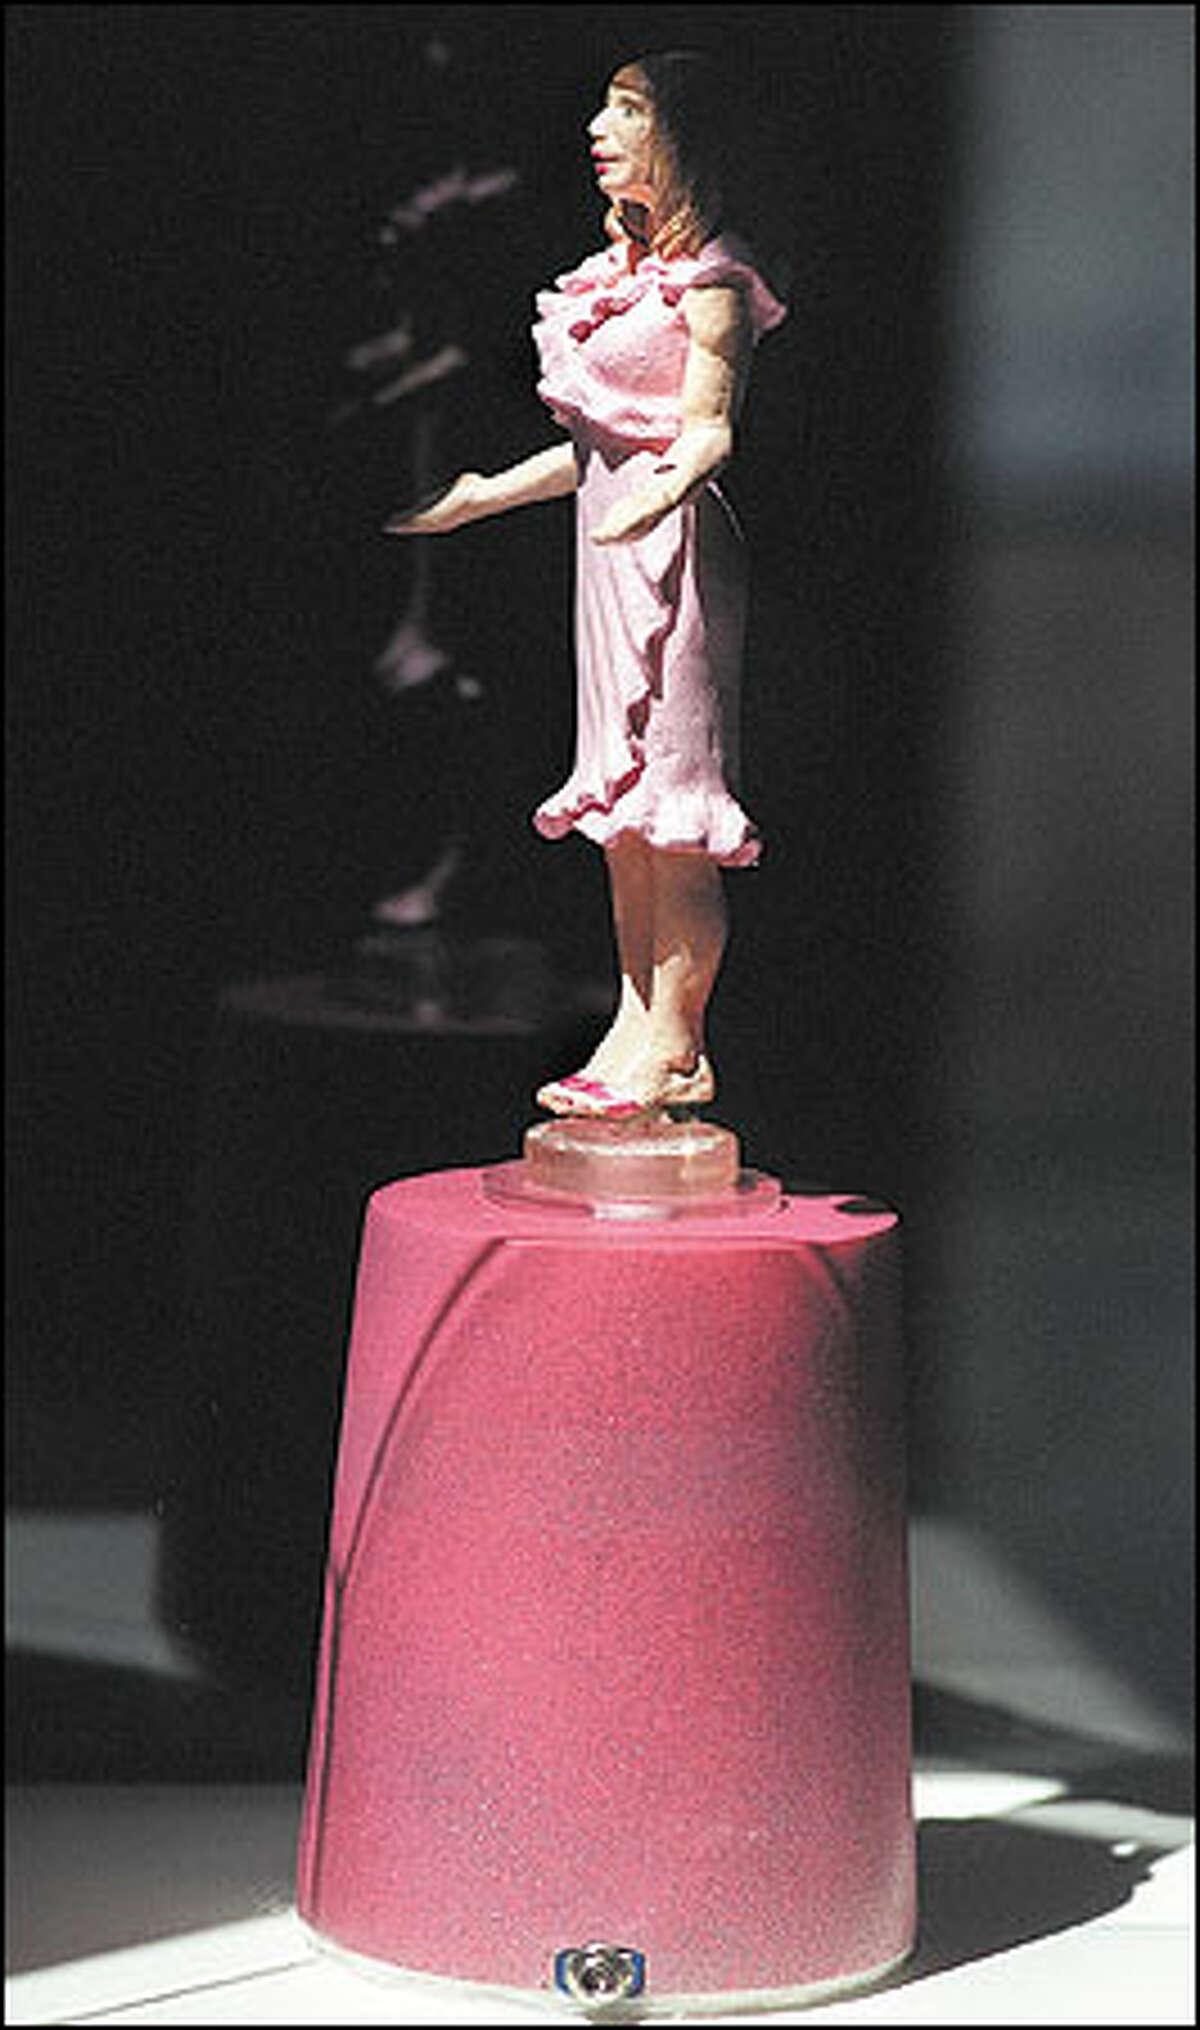 """Action Figure in Pink"" by Seattle artist Nicola Vruwink"